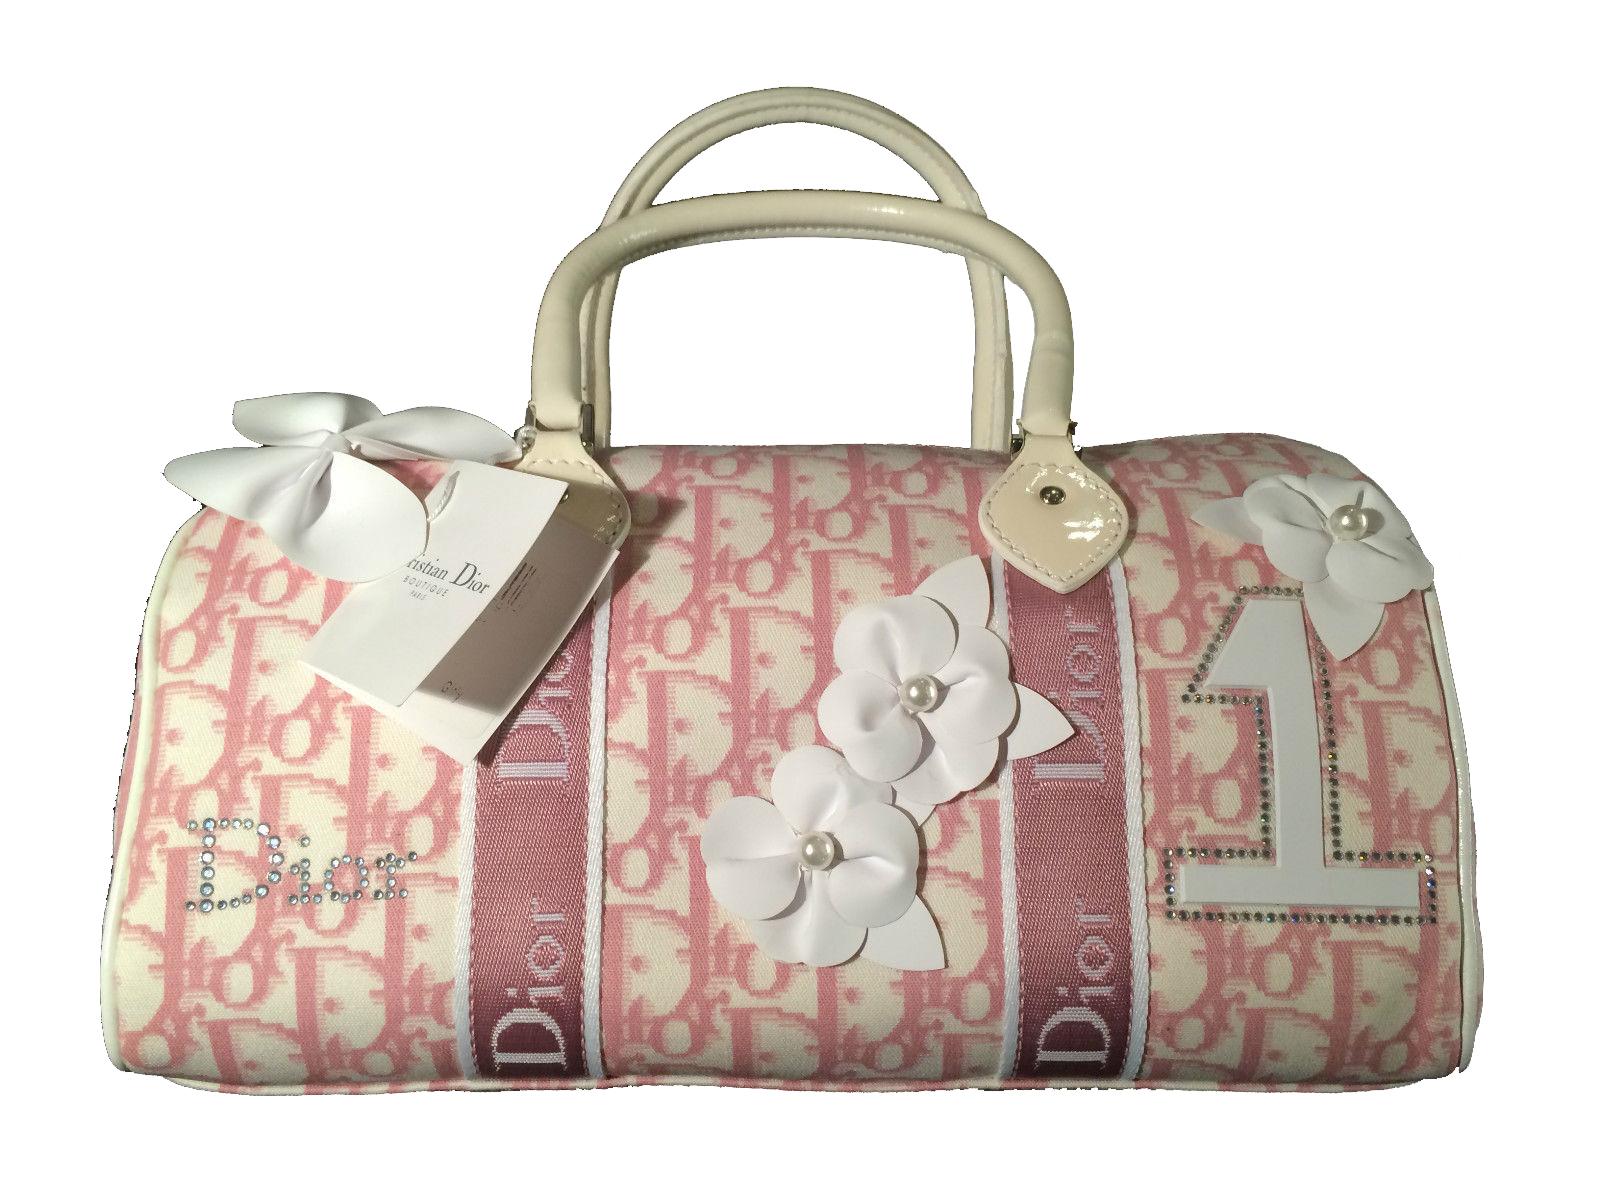 Christian Dior Pink Girly Handbag Vintage Modernism